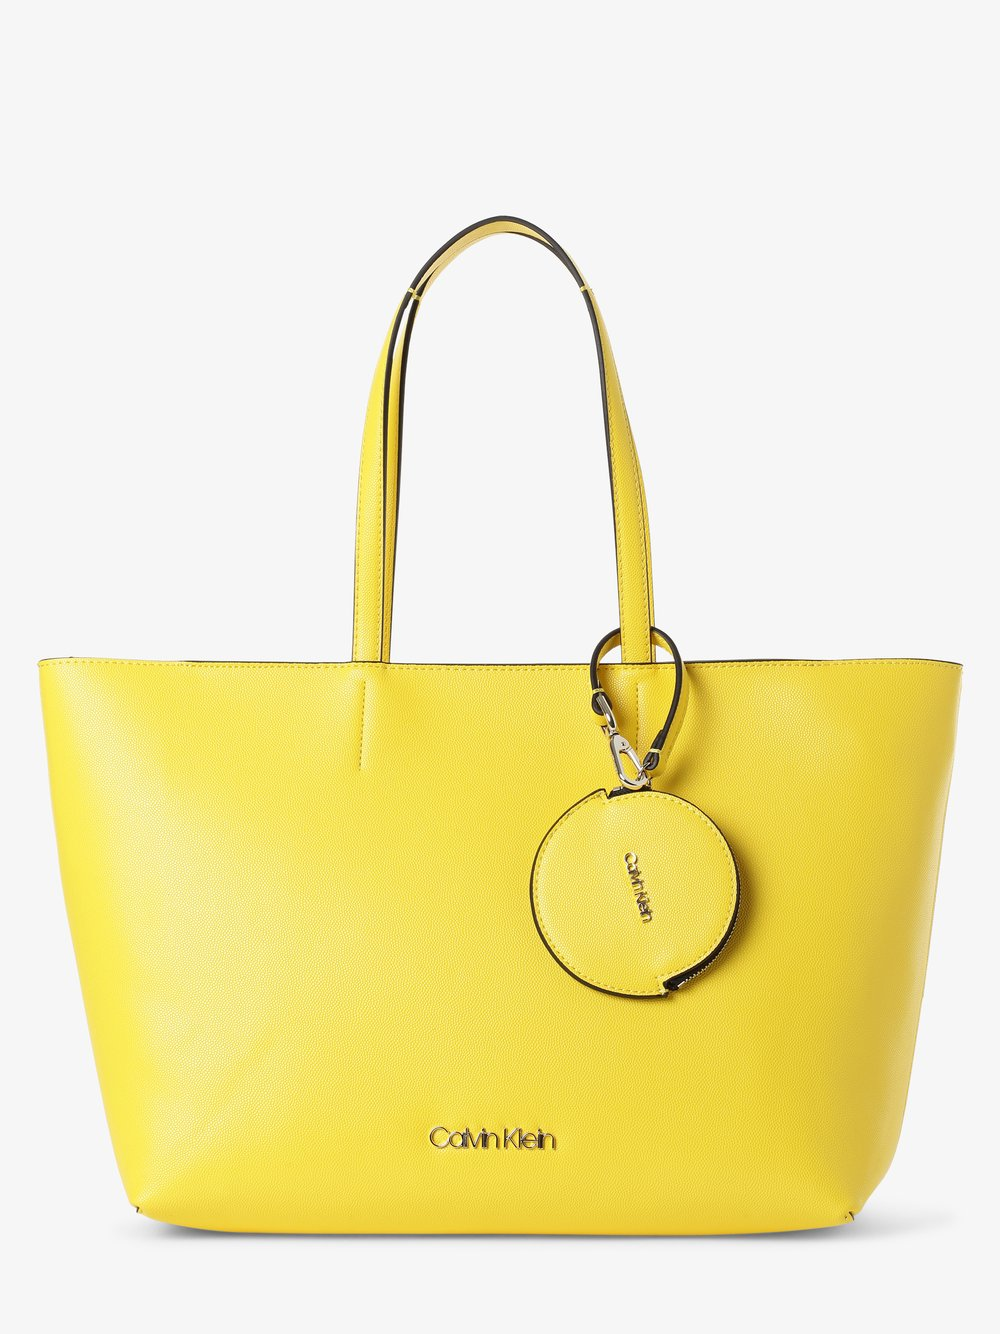 Calvin Klein - Damska torba shopper, żółty